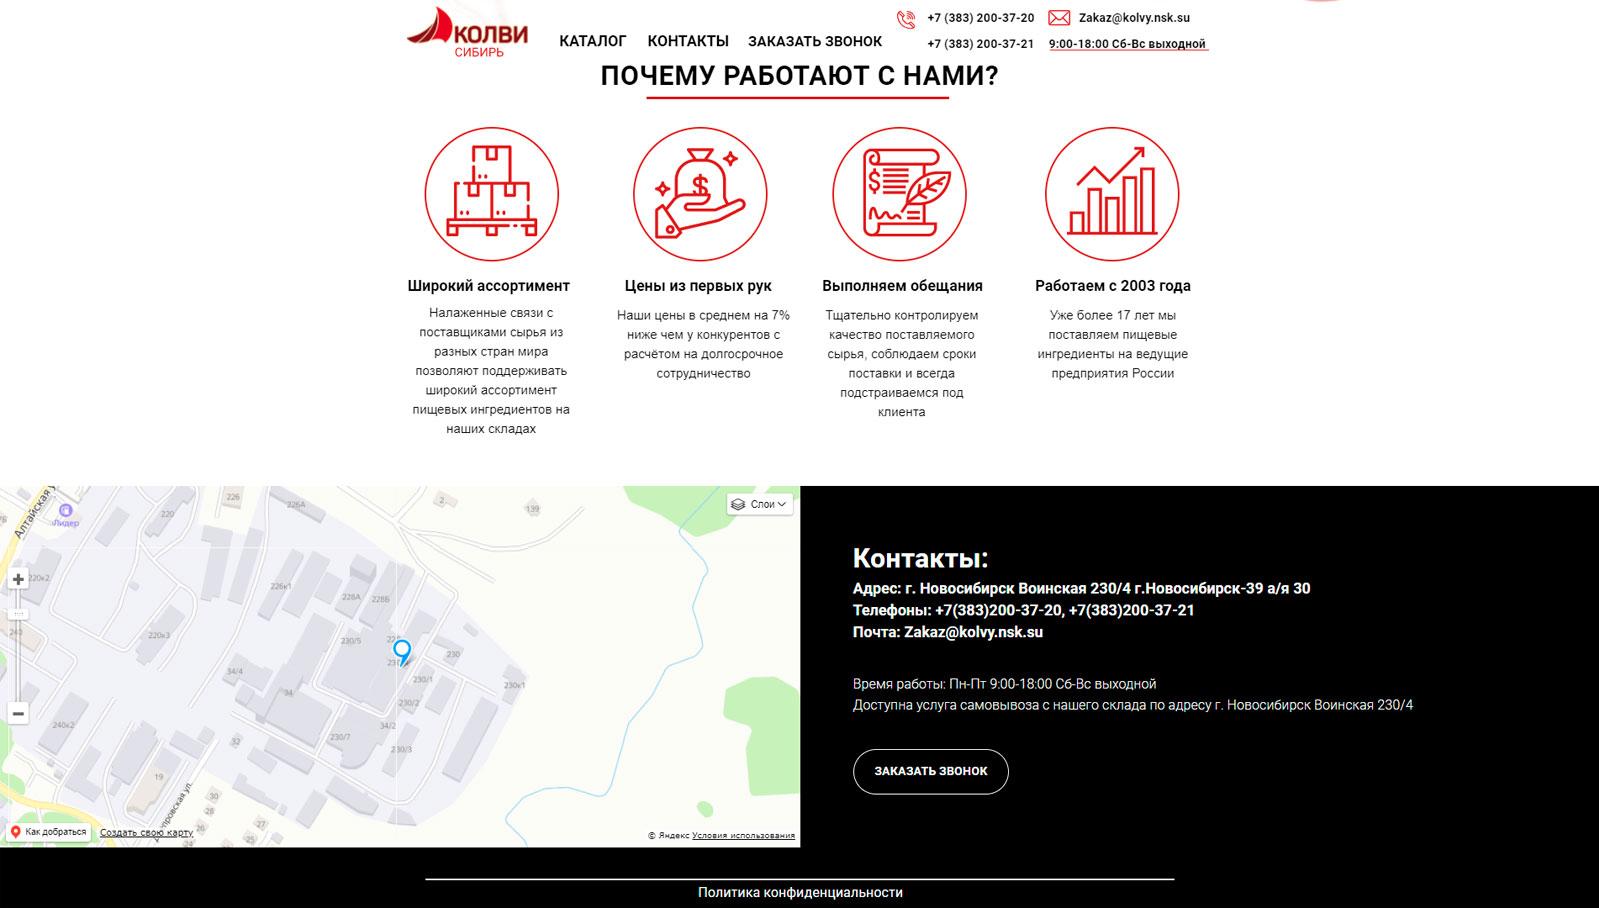 SPS_sajt_kolvy-sib.ru4